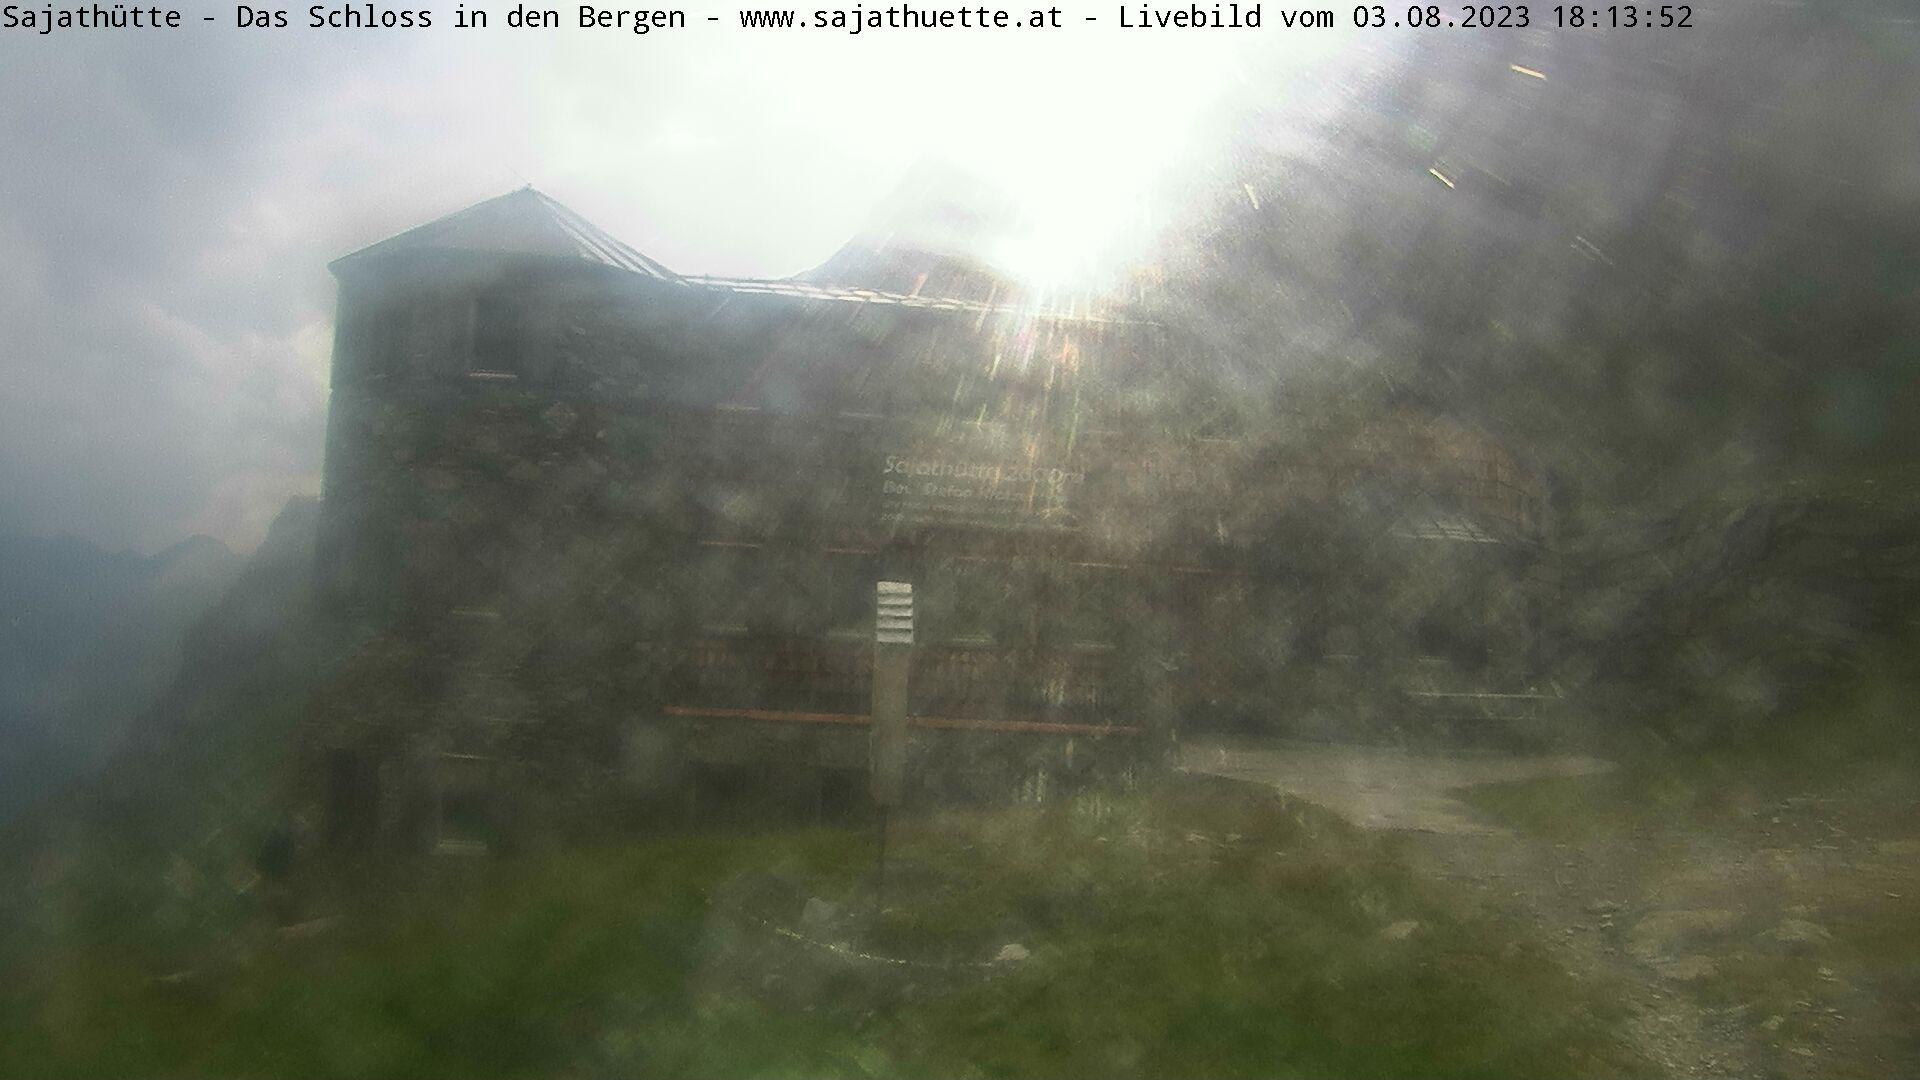 Webcam Webcam Sajathütte   Aktuelles Live-Bild aus 2.600m Seehöhe